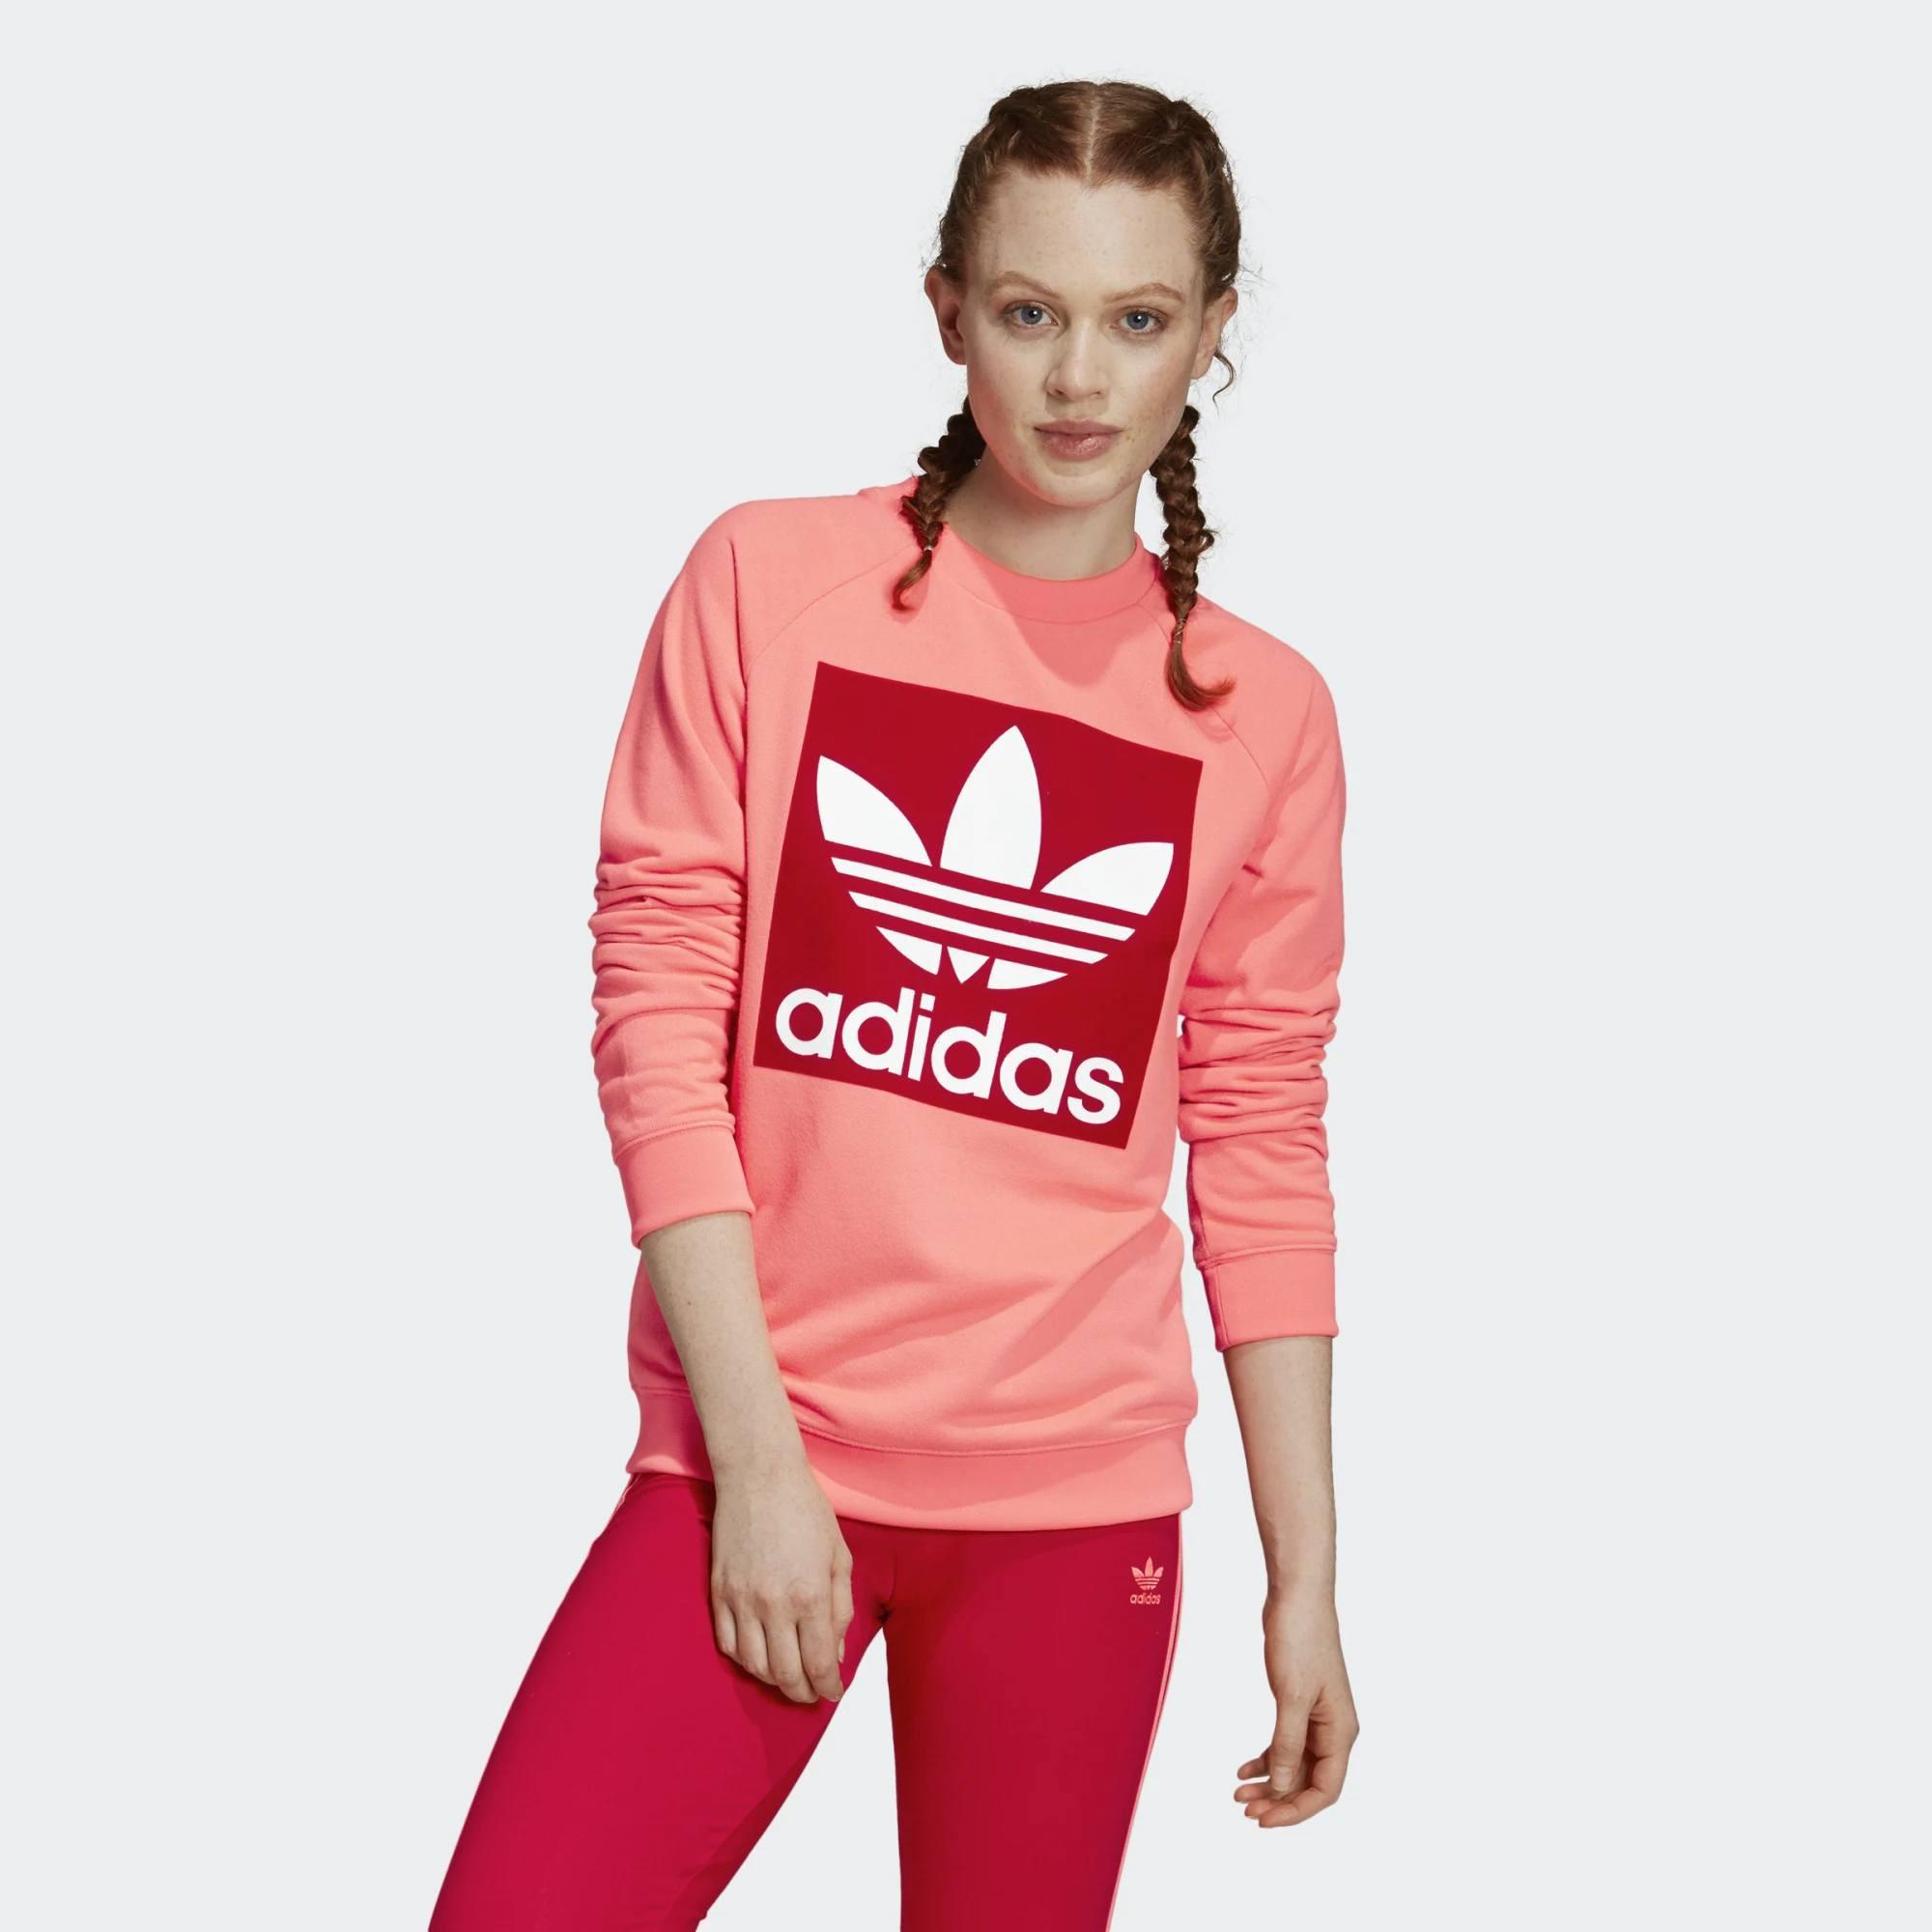 adidas Originals Trefoil Hoodie (9000038140_10547)